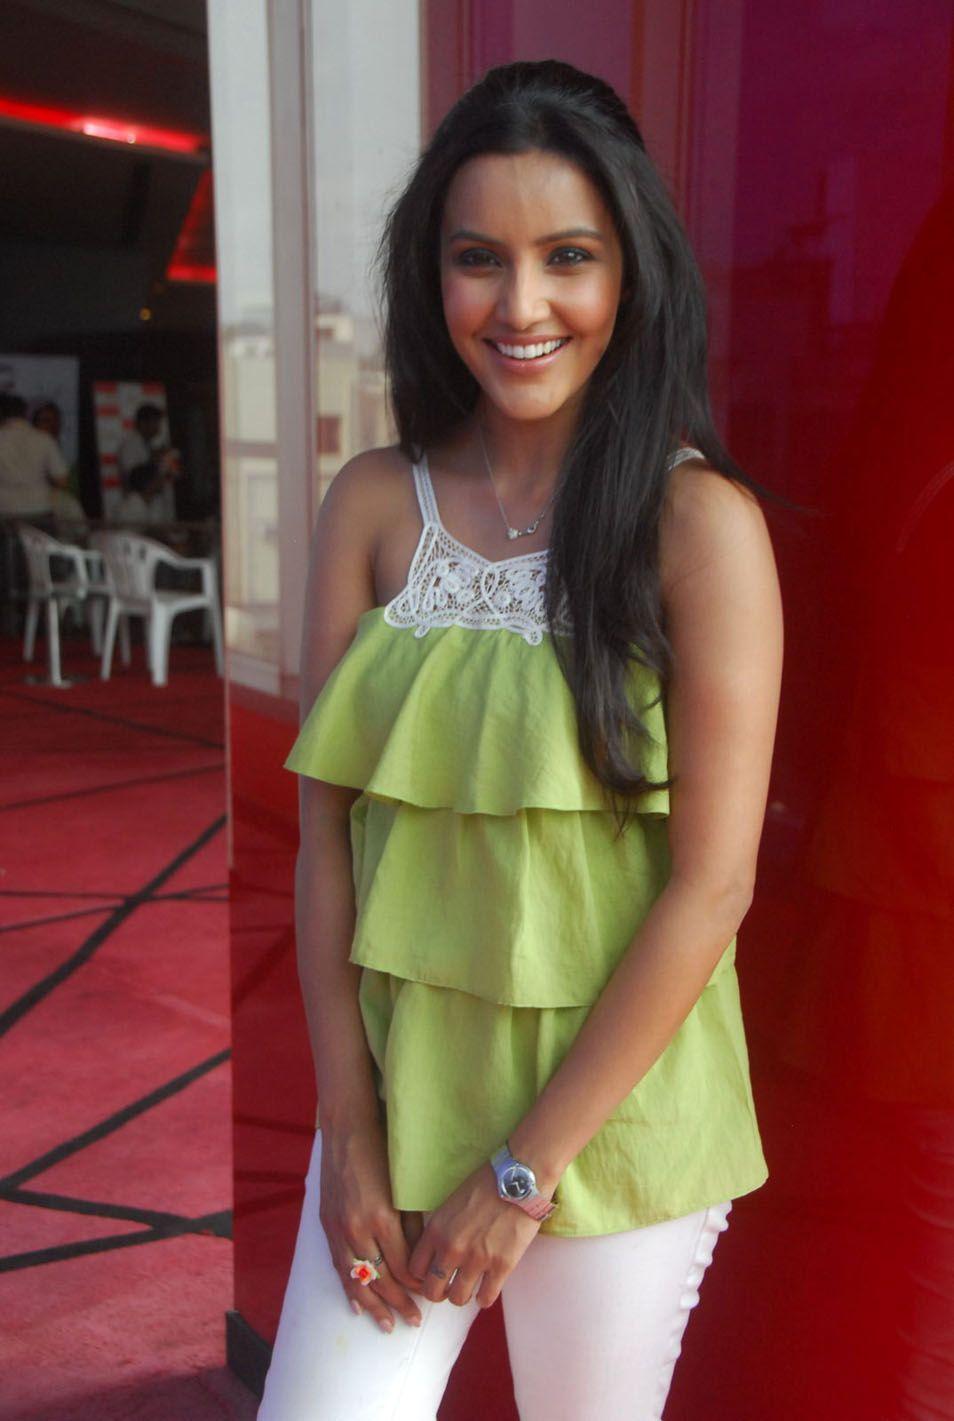 http://4.bp.blogspot.com/-0jJppk2ywfk/ThAOe9dx0_I/AAAAAAAAbuQ/51SgWvdH0XQ/s1600/telugu+actress+priya+anand+3.jpg